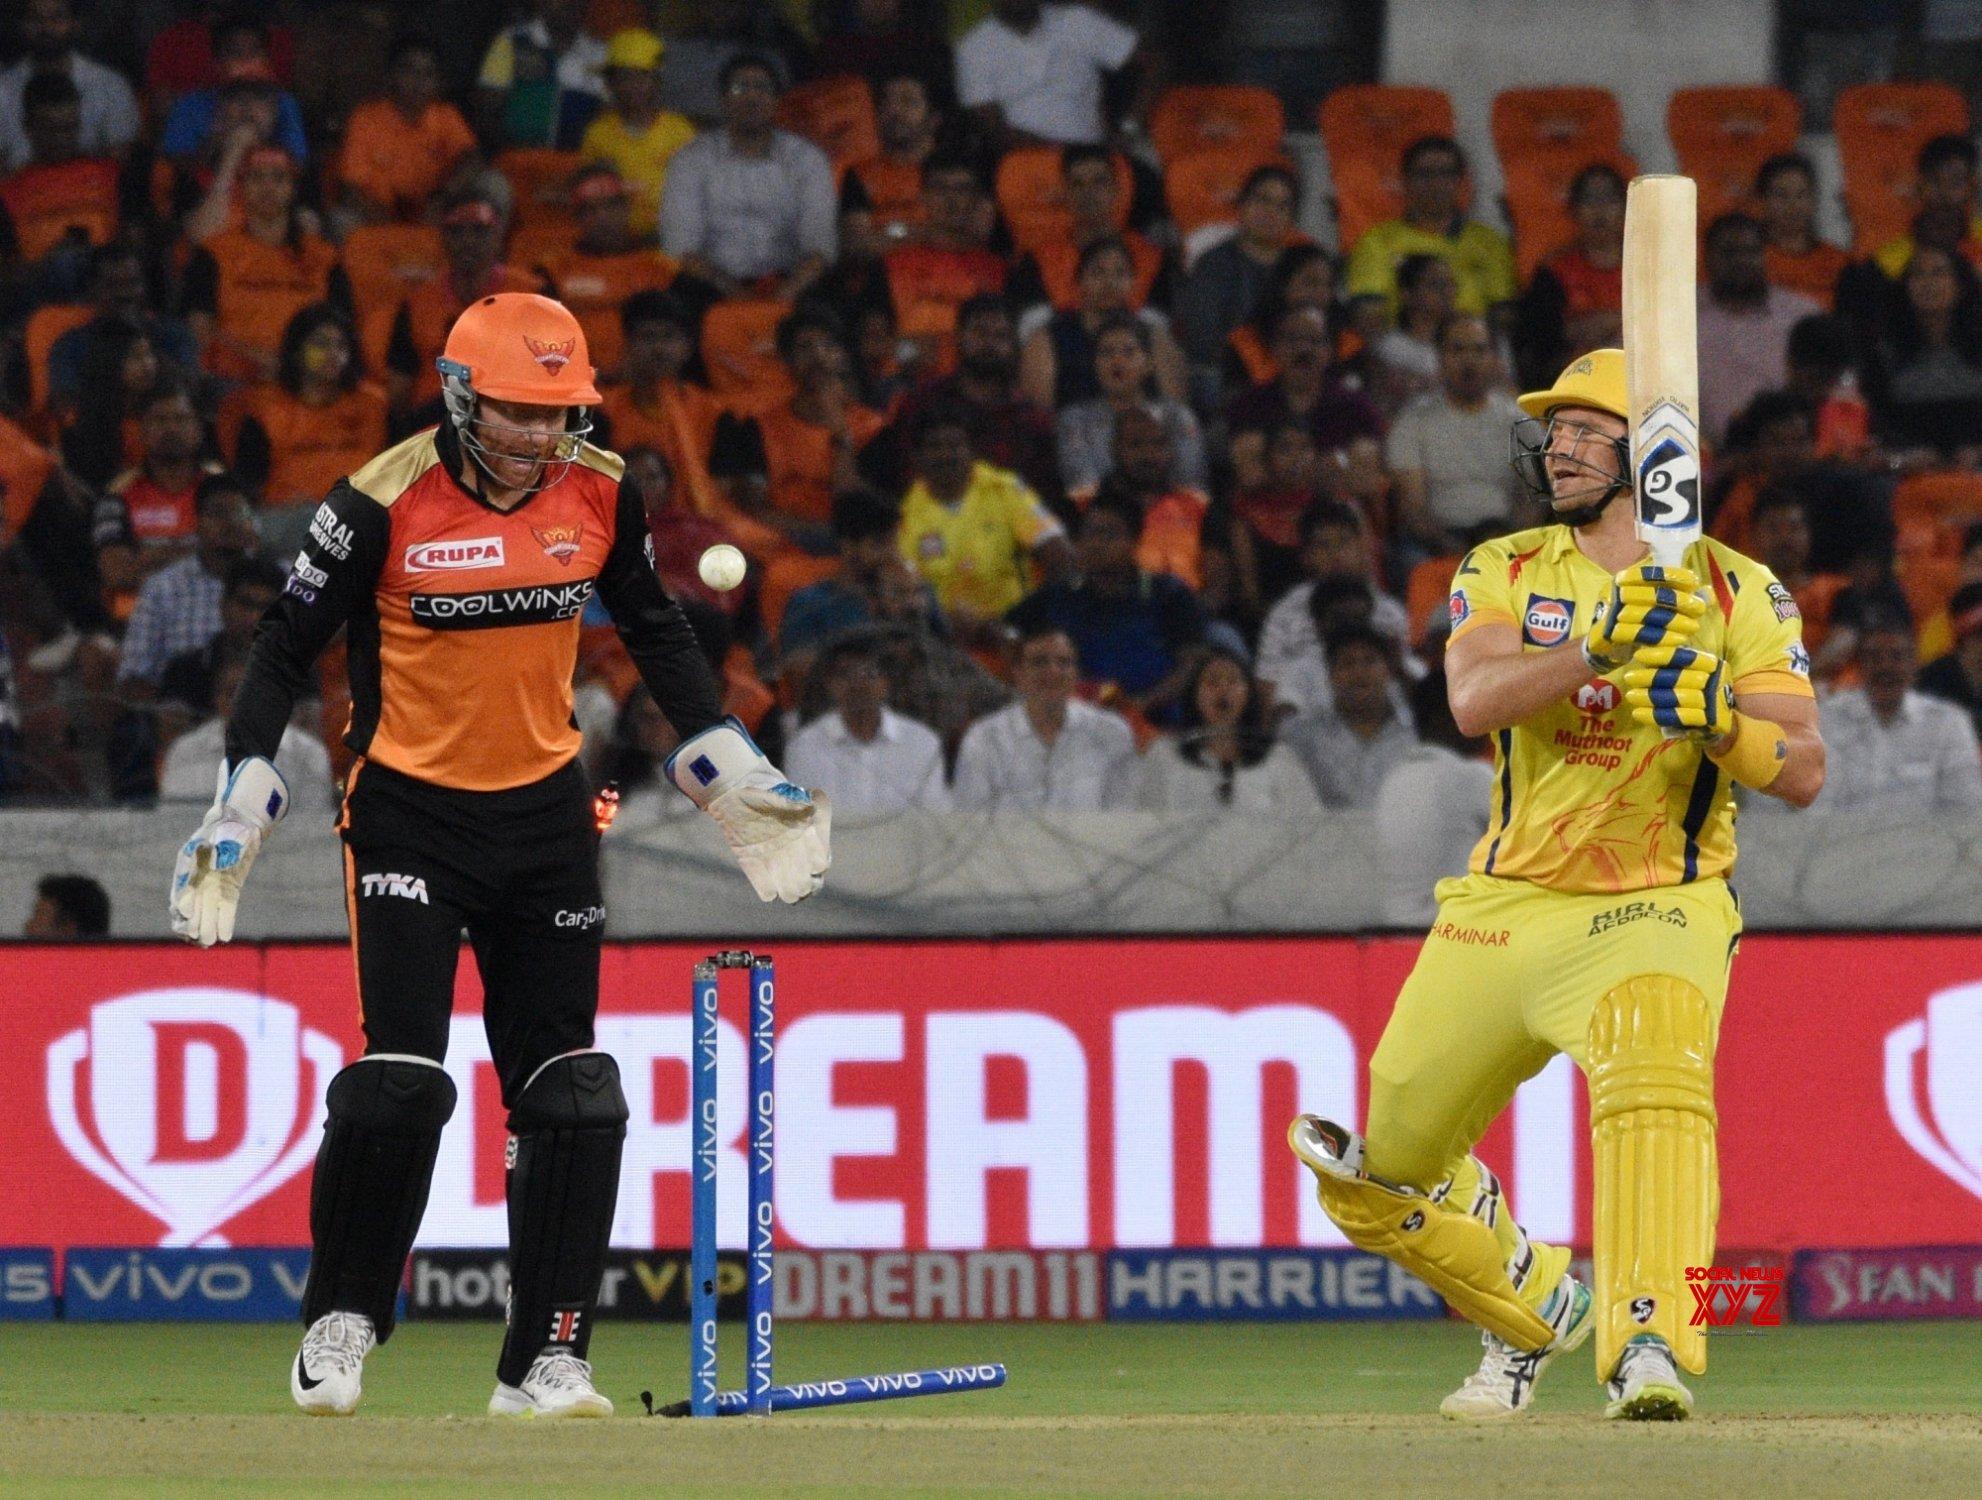 Hyderabad: IPL 2019 - Match 33 - Sunrisers Hyderabad Vs Chennai Super Kings (Batch - 16) #Gallery